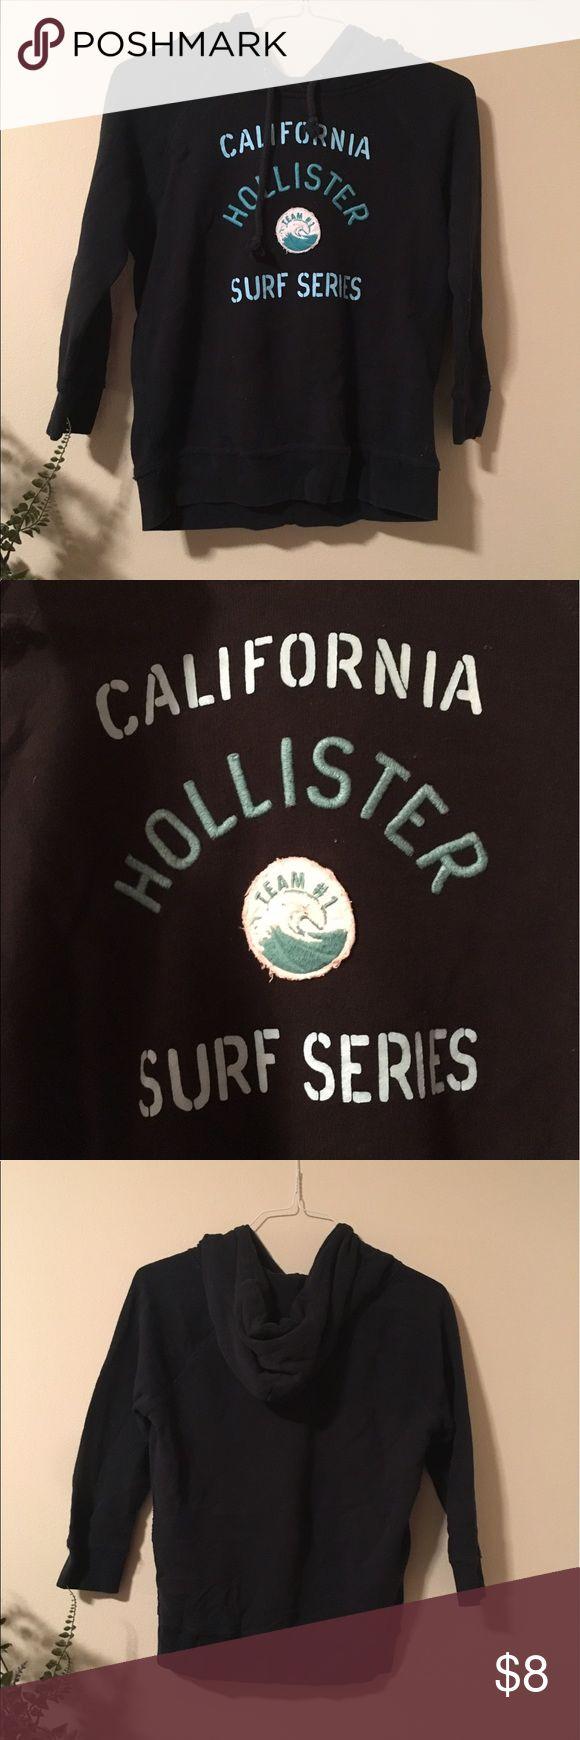 HOLLISTER SURF HOODIE- NAVY Navy and light blue hollister lightweight hoodie. 3 quarter sleeve Hollister Tops Sweatshirts & Hoodies